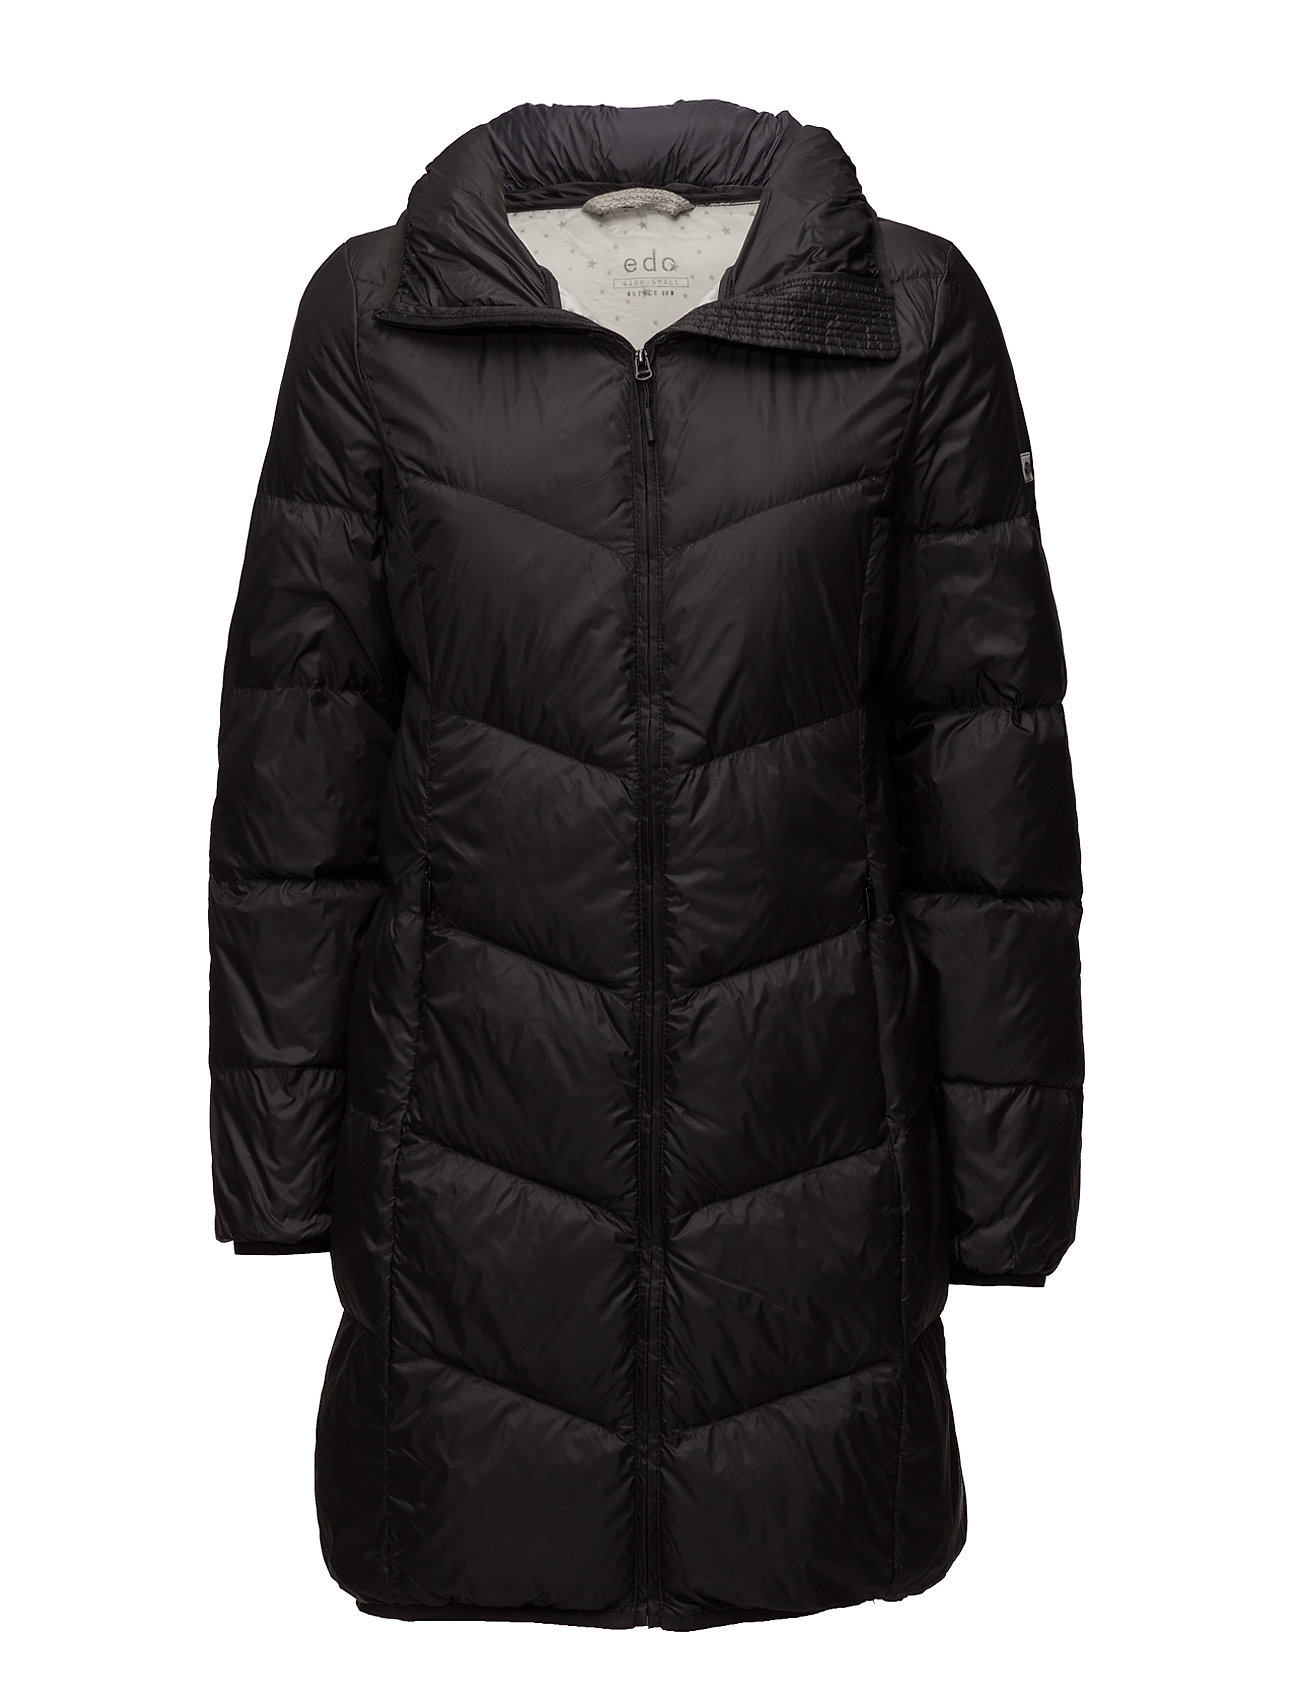 Coats Woven EDC by Esprit Frakker til Damer i Sort